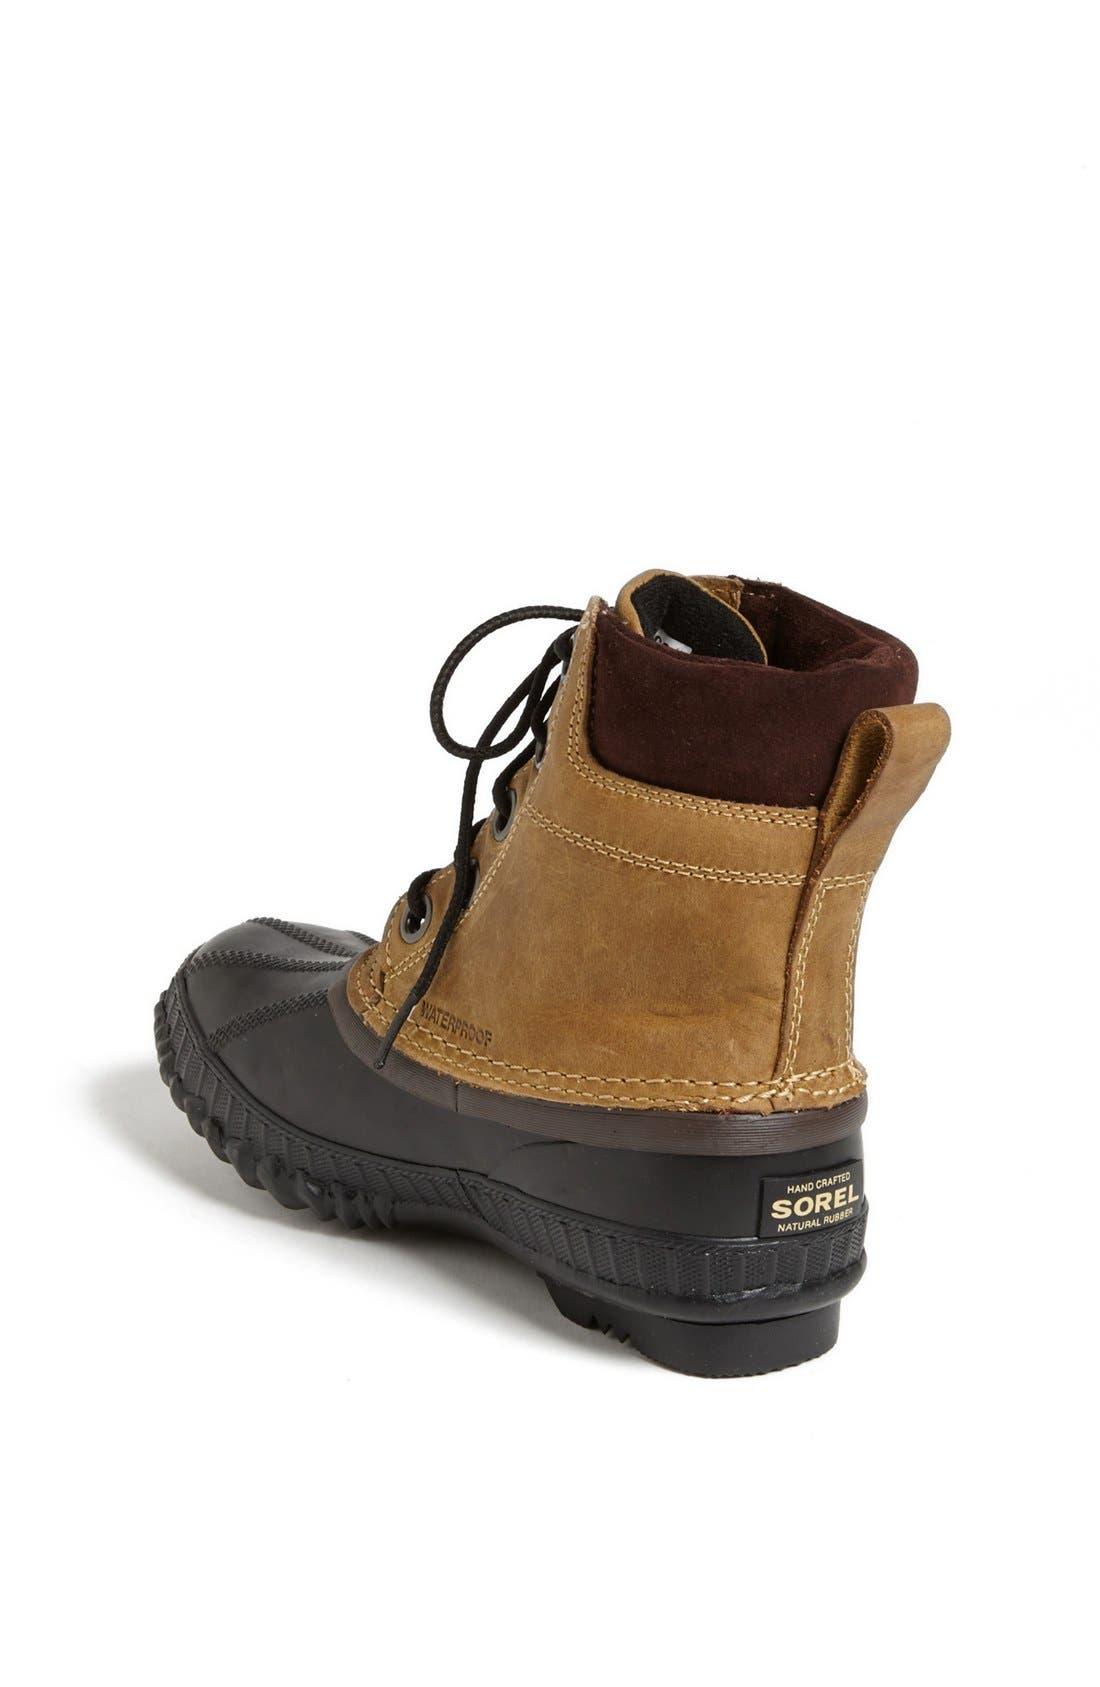 Alternate Image 2  - SOREL 'Cheyenne' Boot (Little Kid & Big Kid)